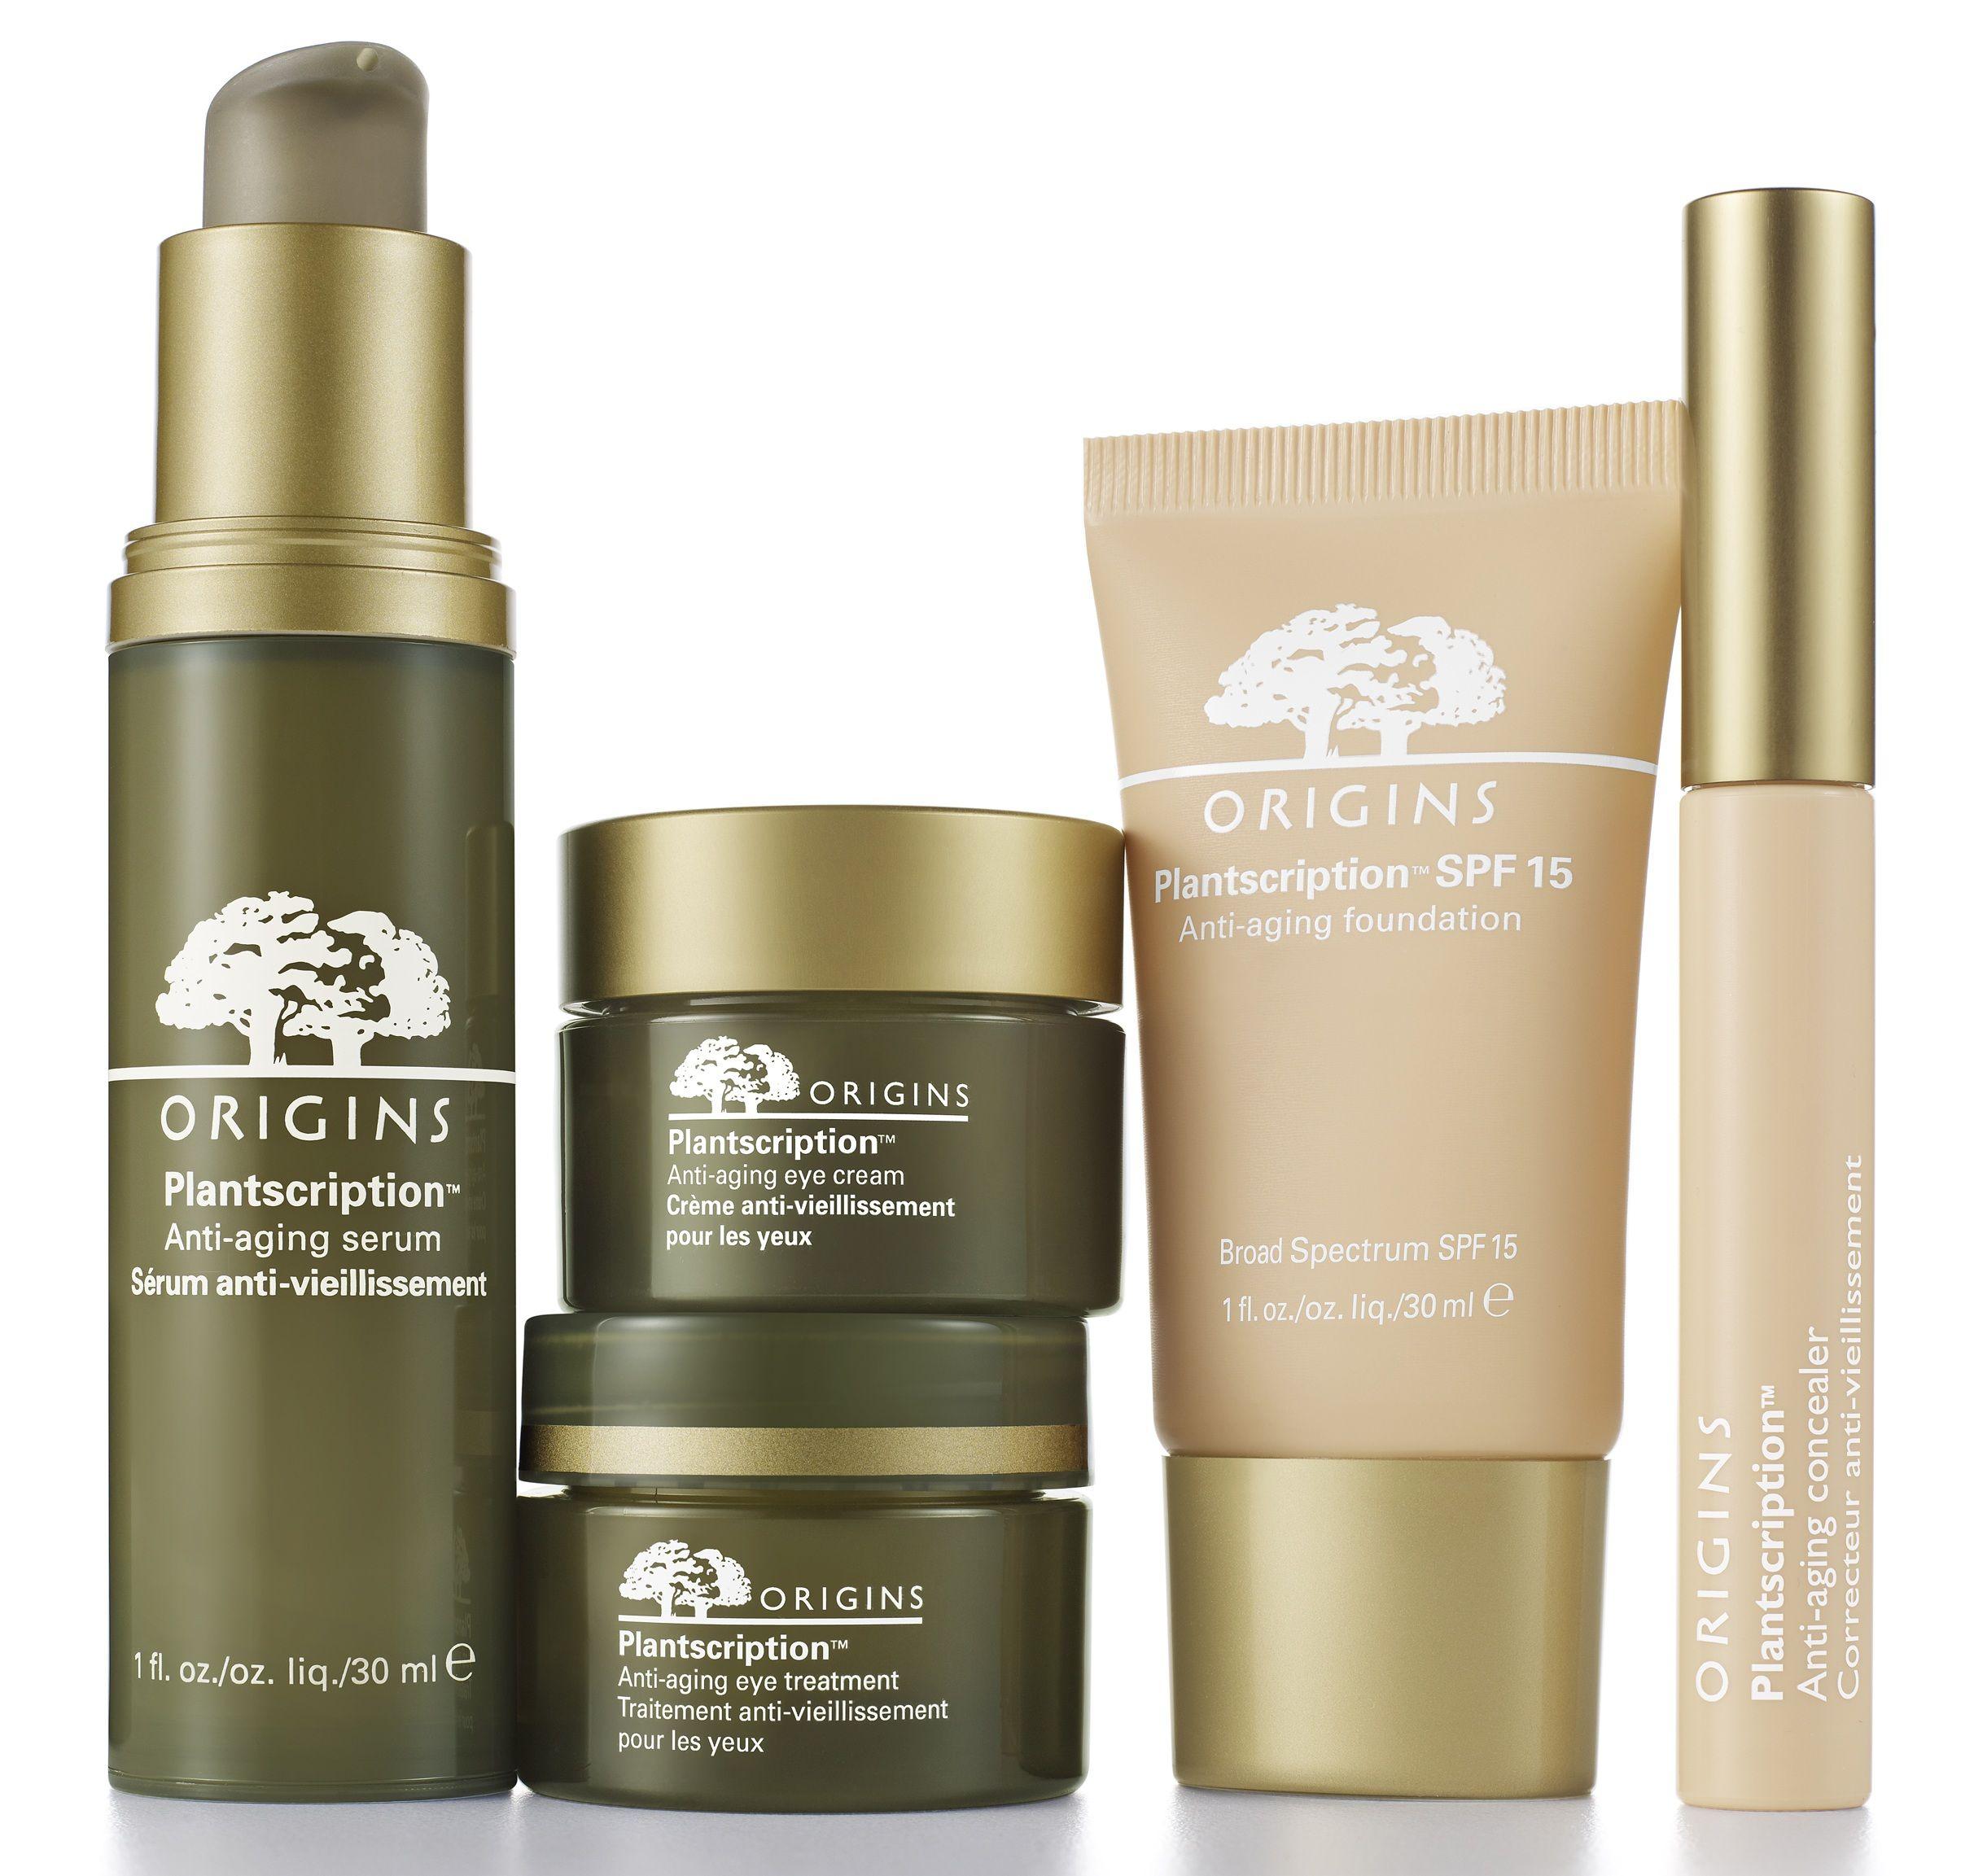 Origins products Origins plantscription, Beauty skin